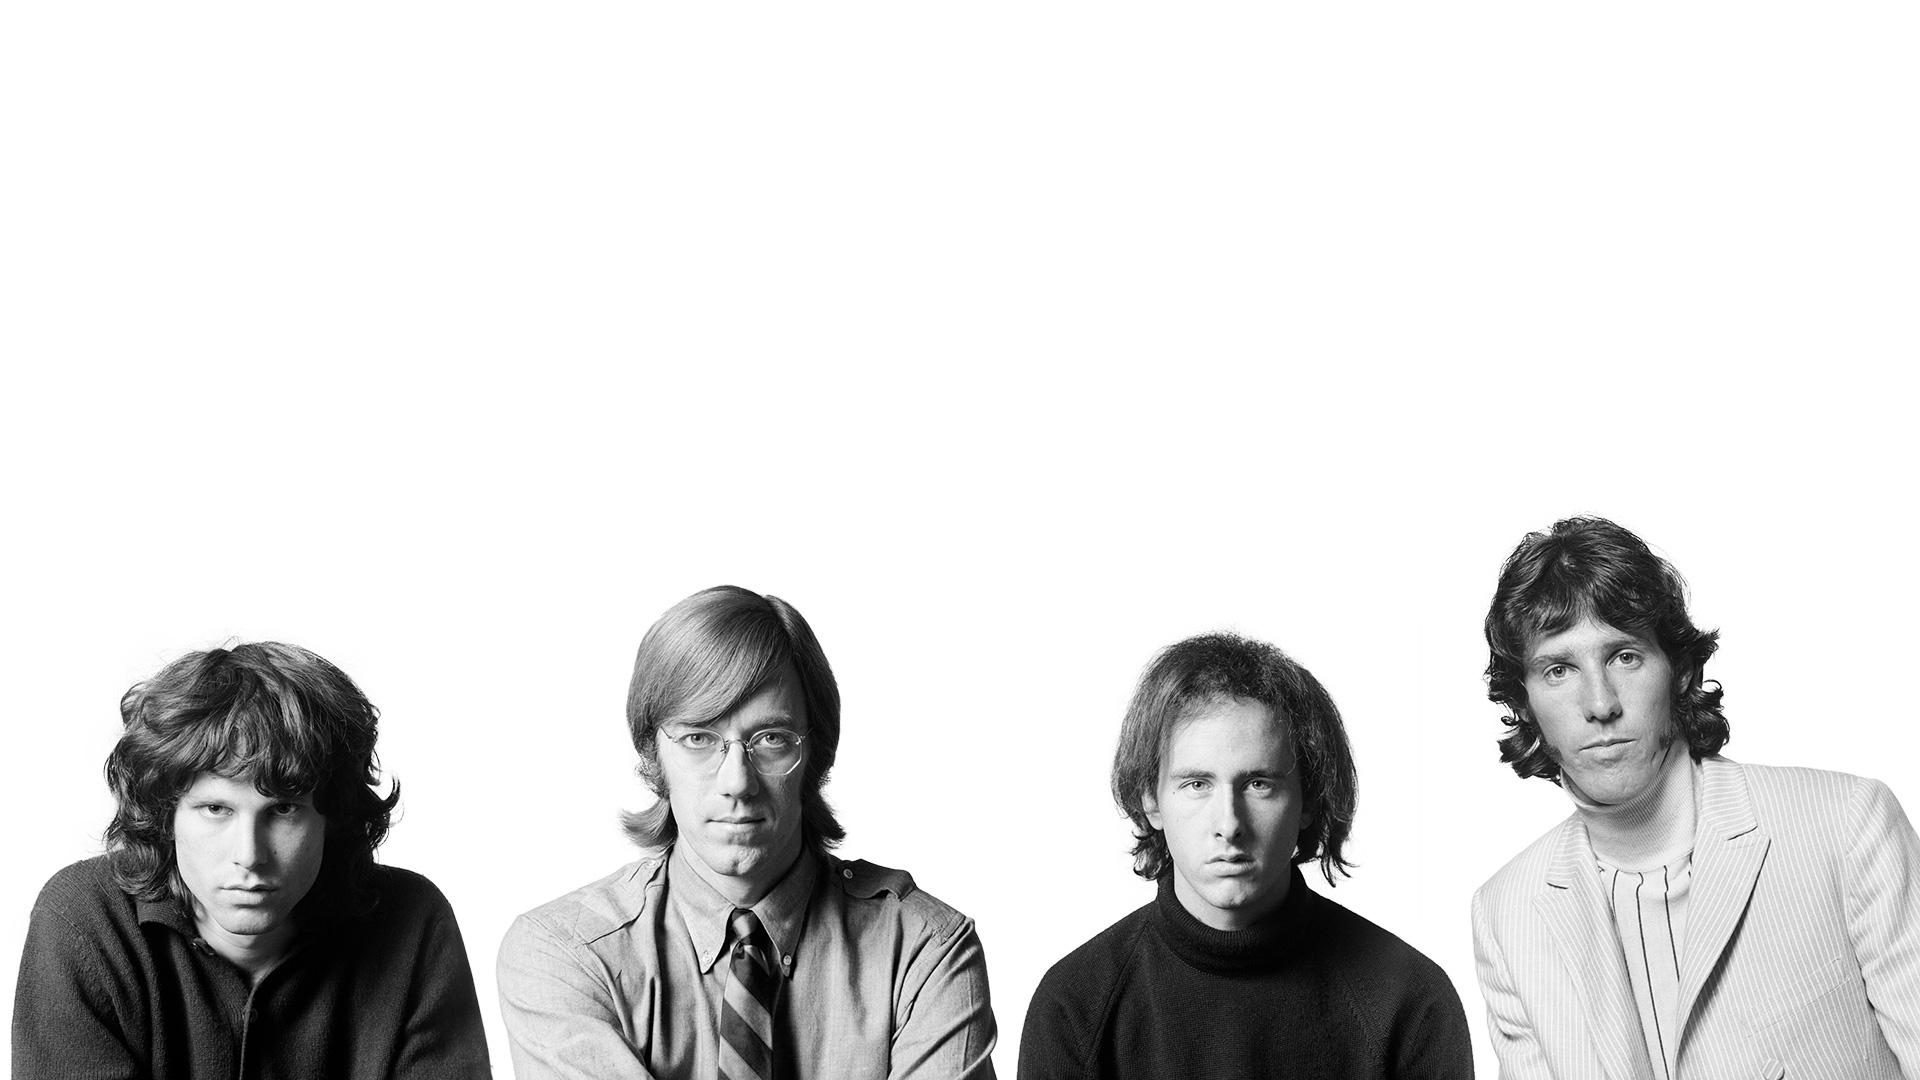 cool-band-rock-legend-23-The-Doors